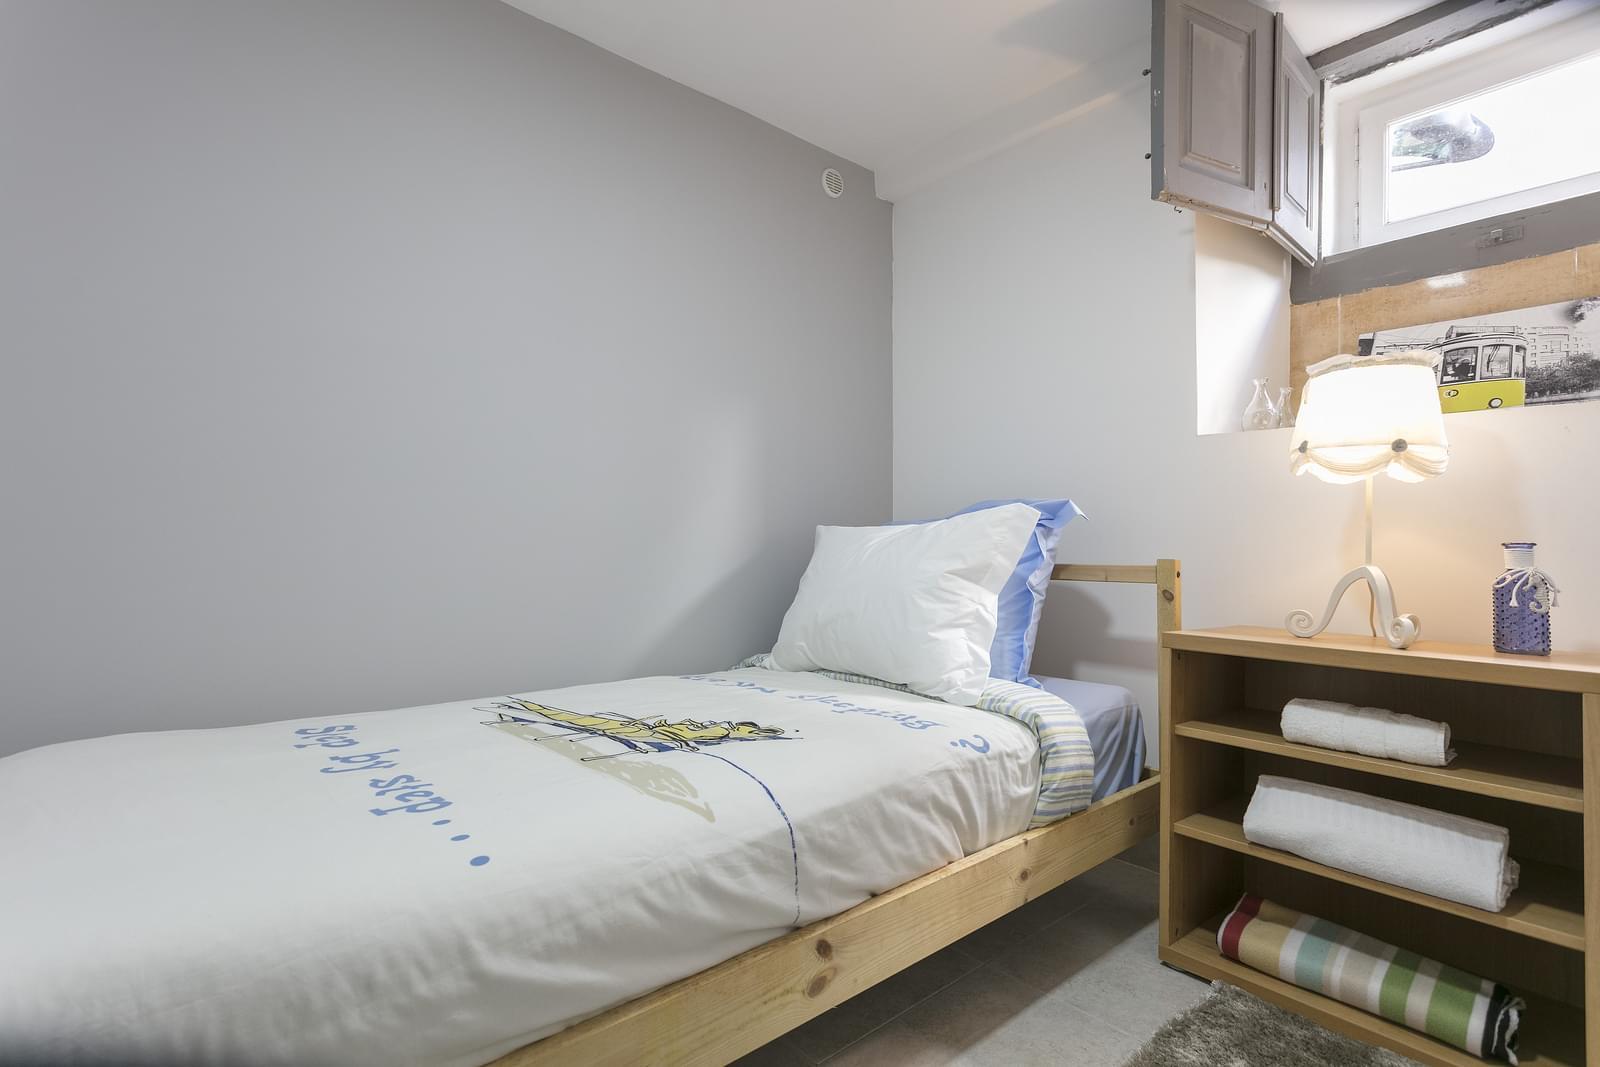 pf16716-apartamento-t2-3-lisboa-c00908e1-0c4b-4993-99a9-67a67ba5c33b